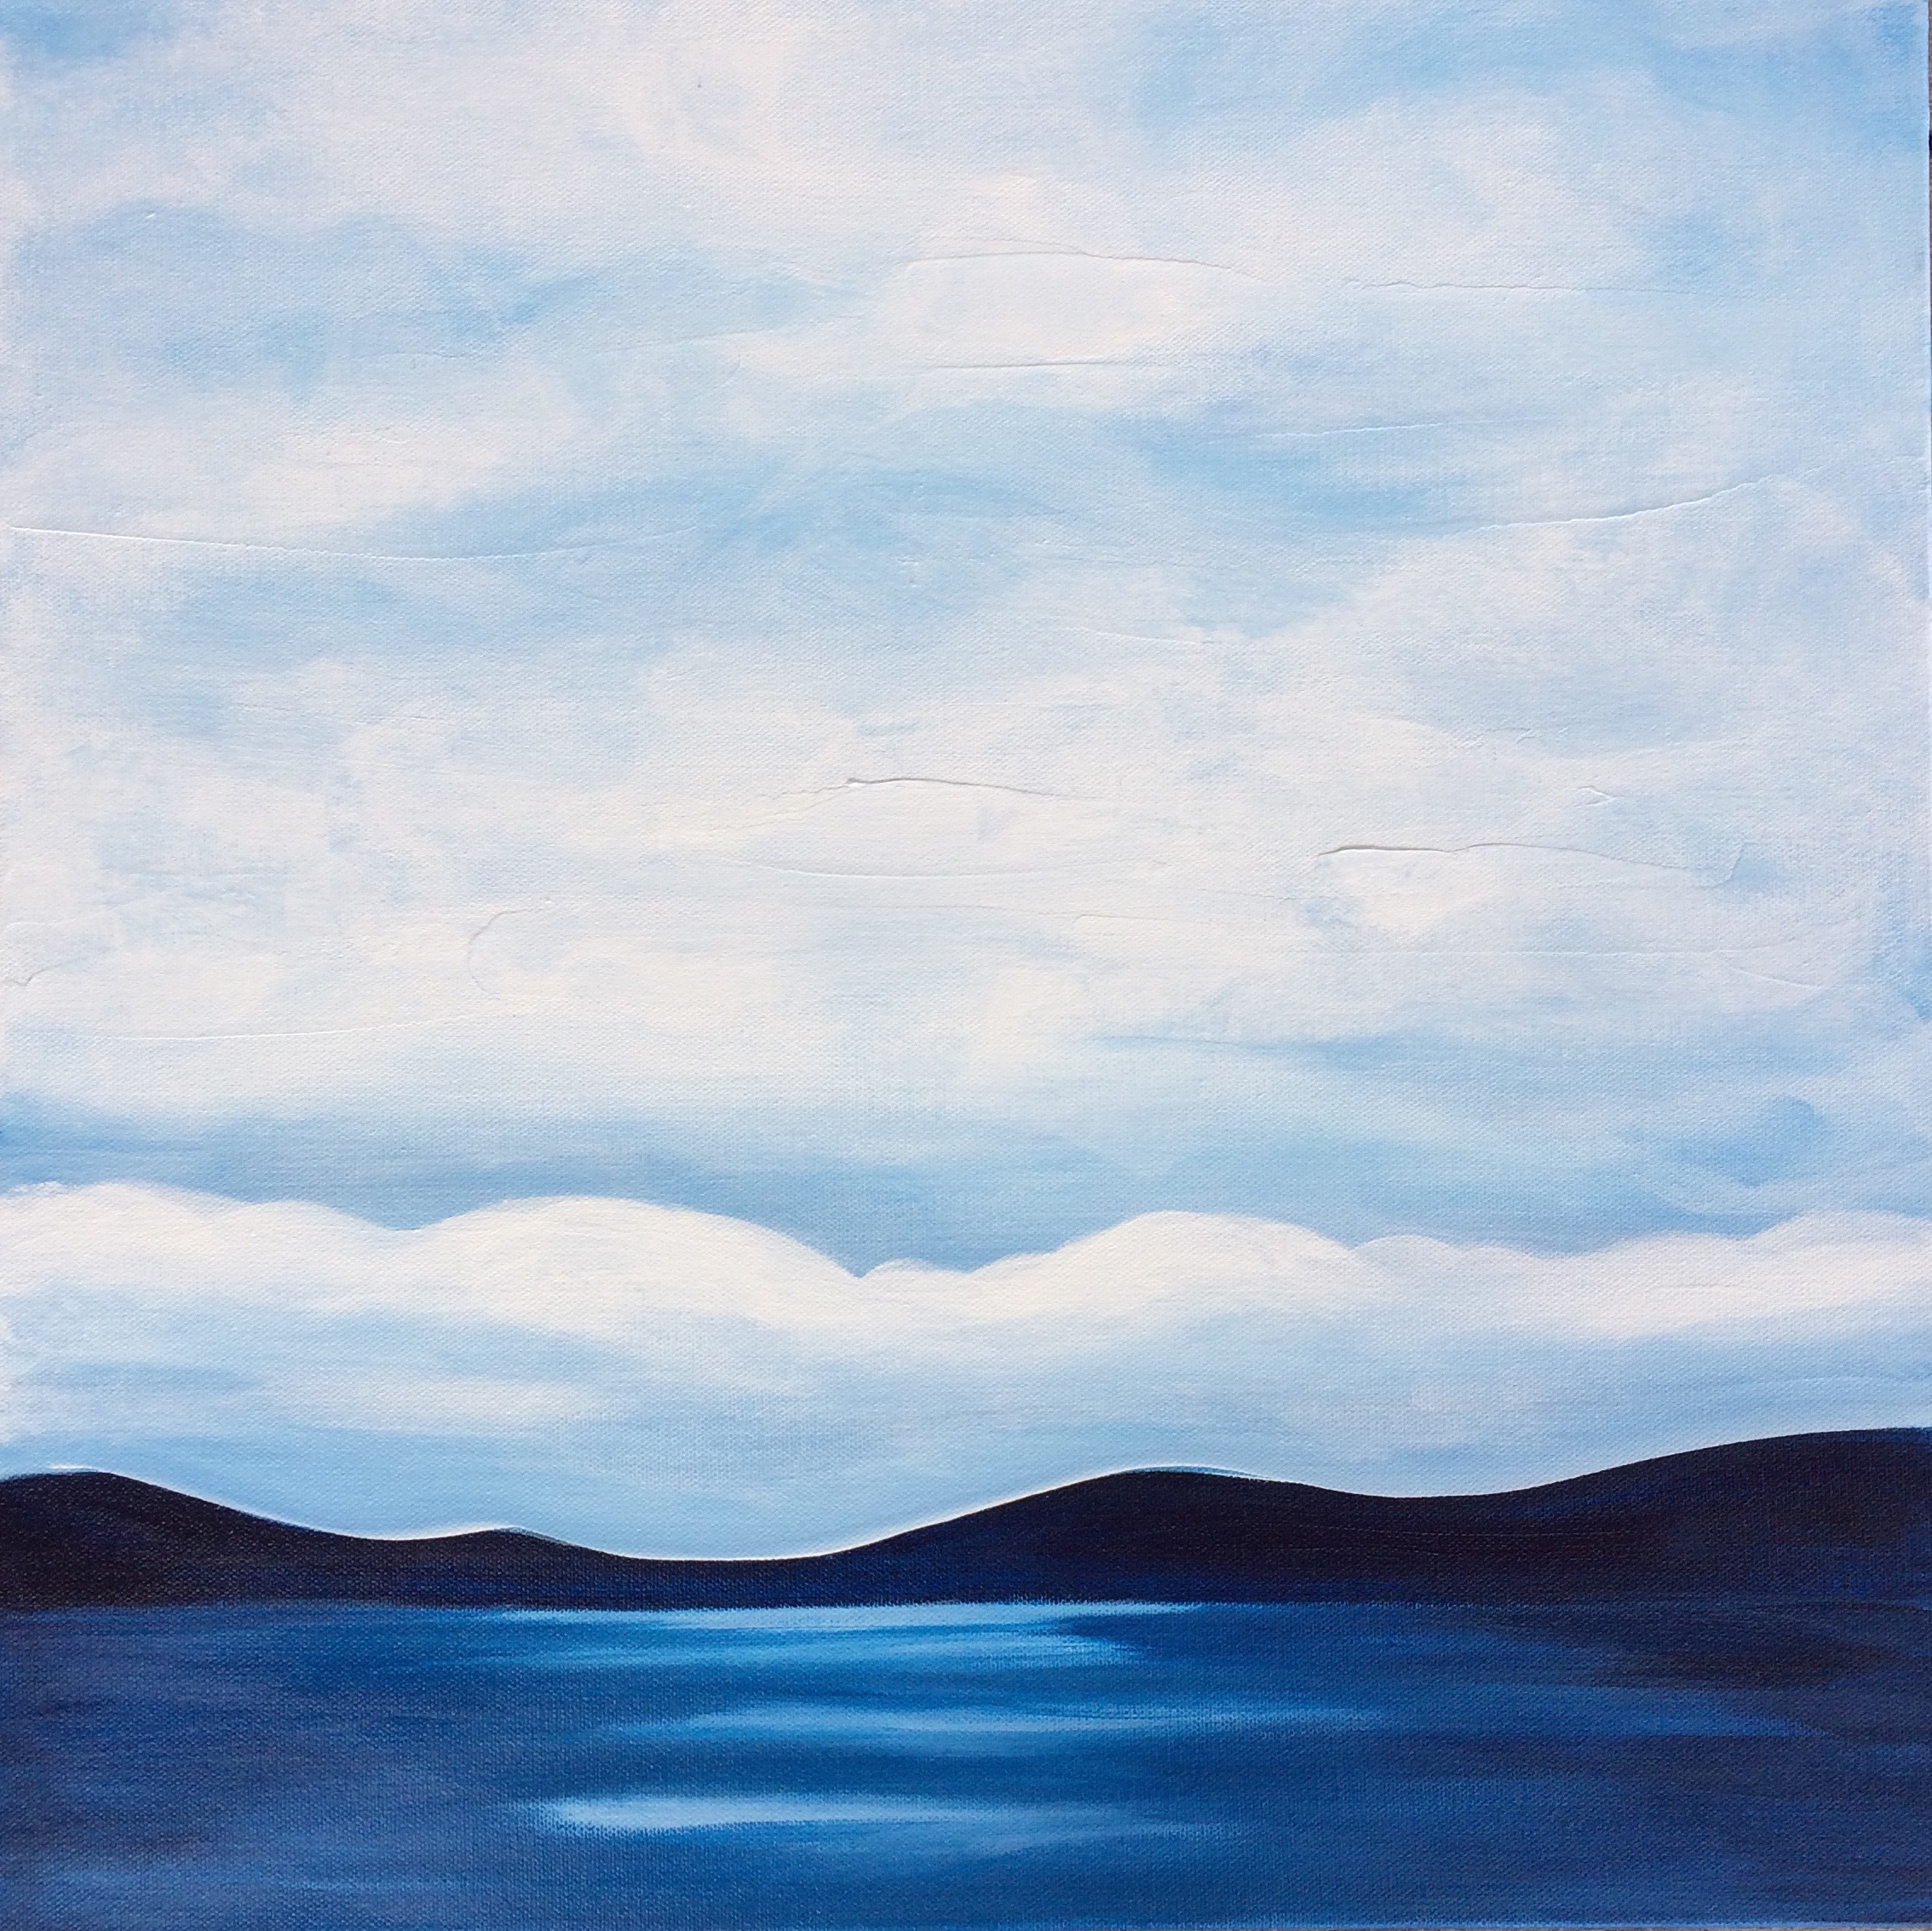 Cloud Reflections; 20 x 20 x 1.5; acrylic on canvas Jill McDougall